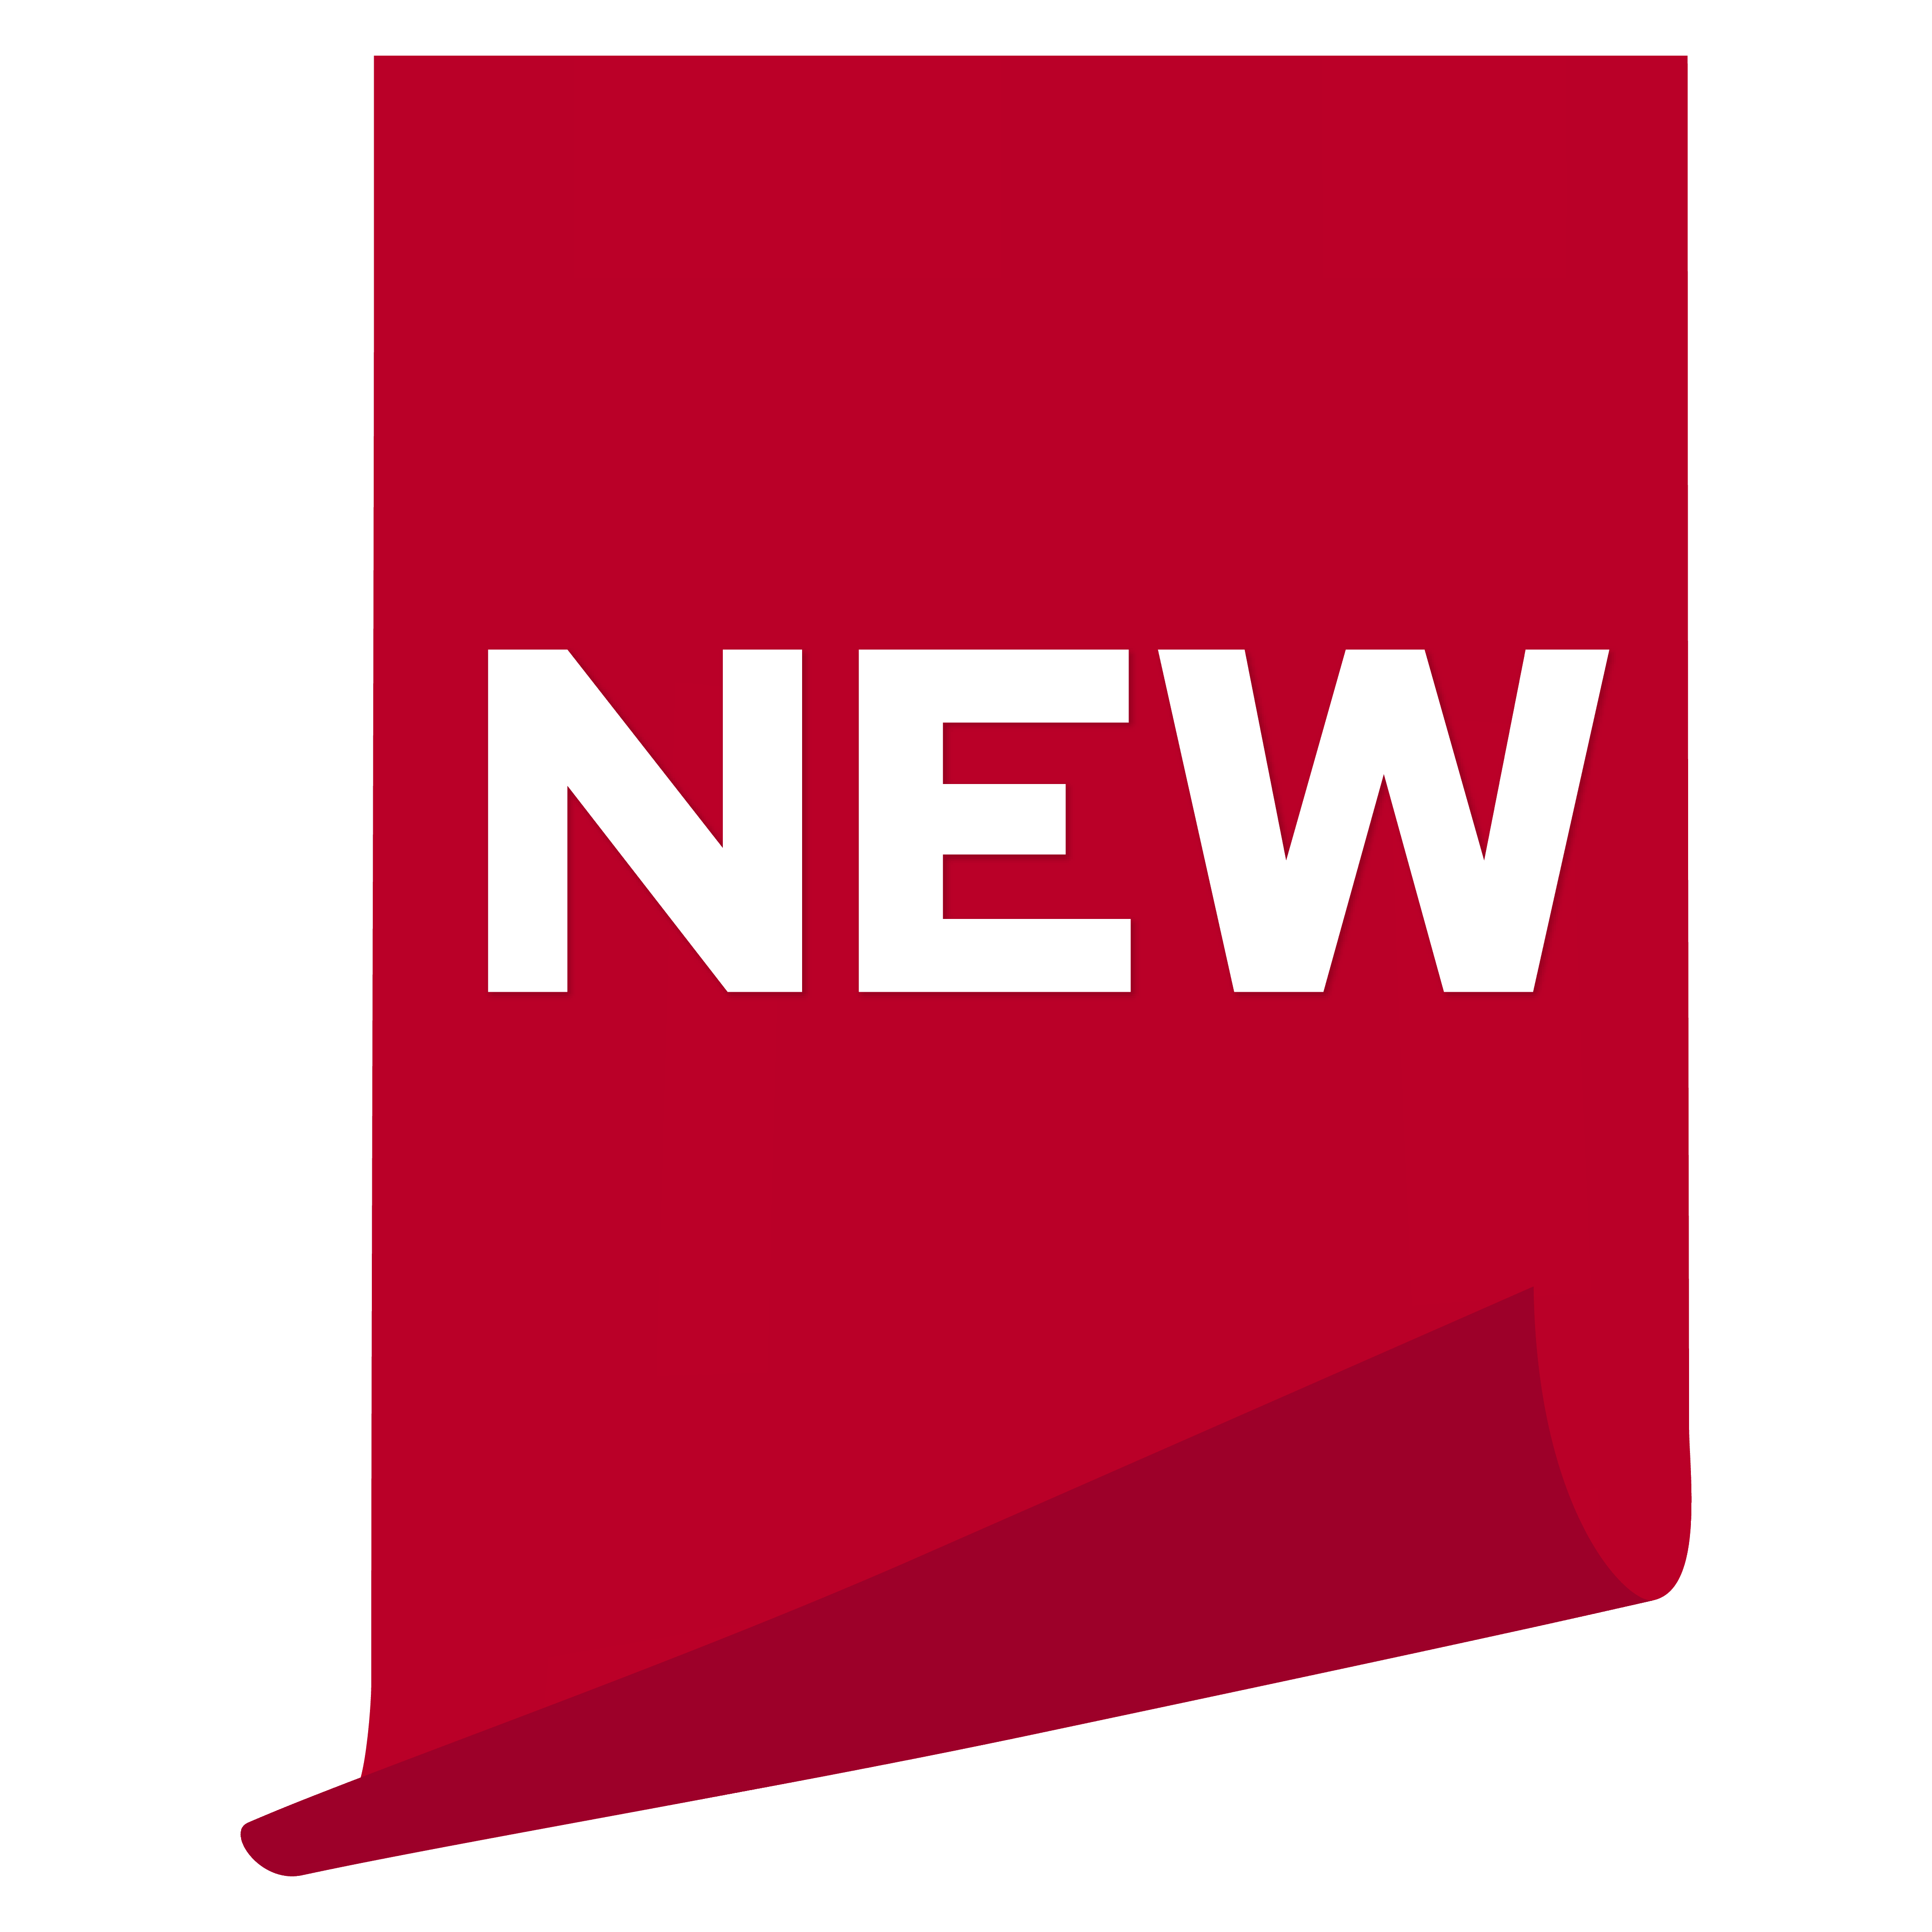 https://japana.vn/uploads/promotion/2020/08/14/1597375290-13x.08.2020-02-min.png